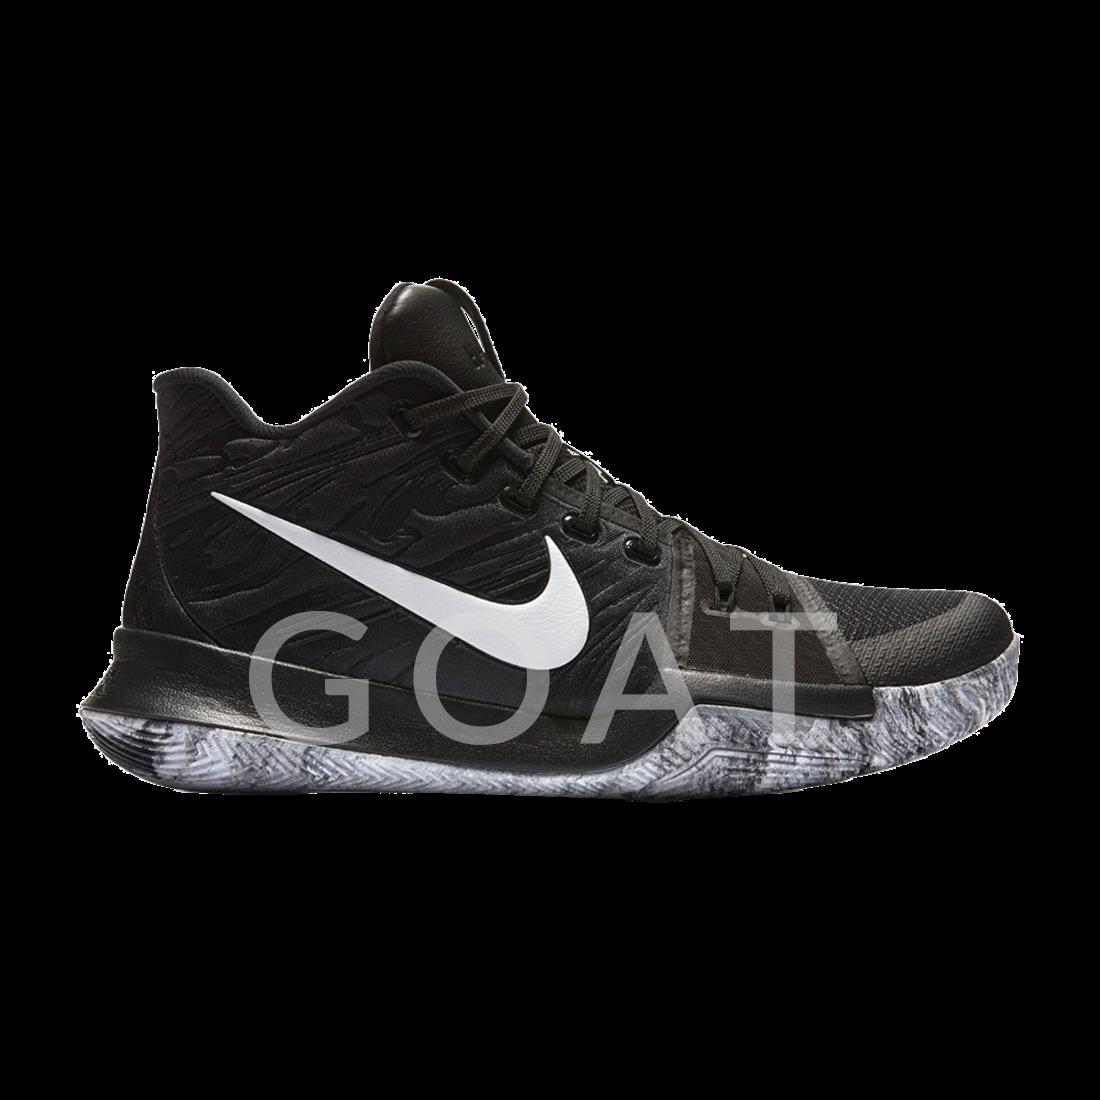 b358851954cf Kyrie 3  BHM  - Nike - 852415 001 - Black Metallic Gold-White